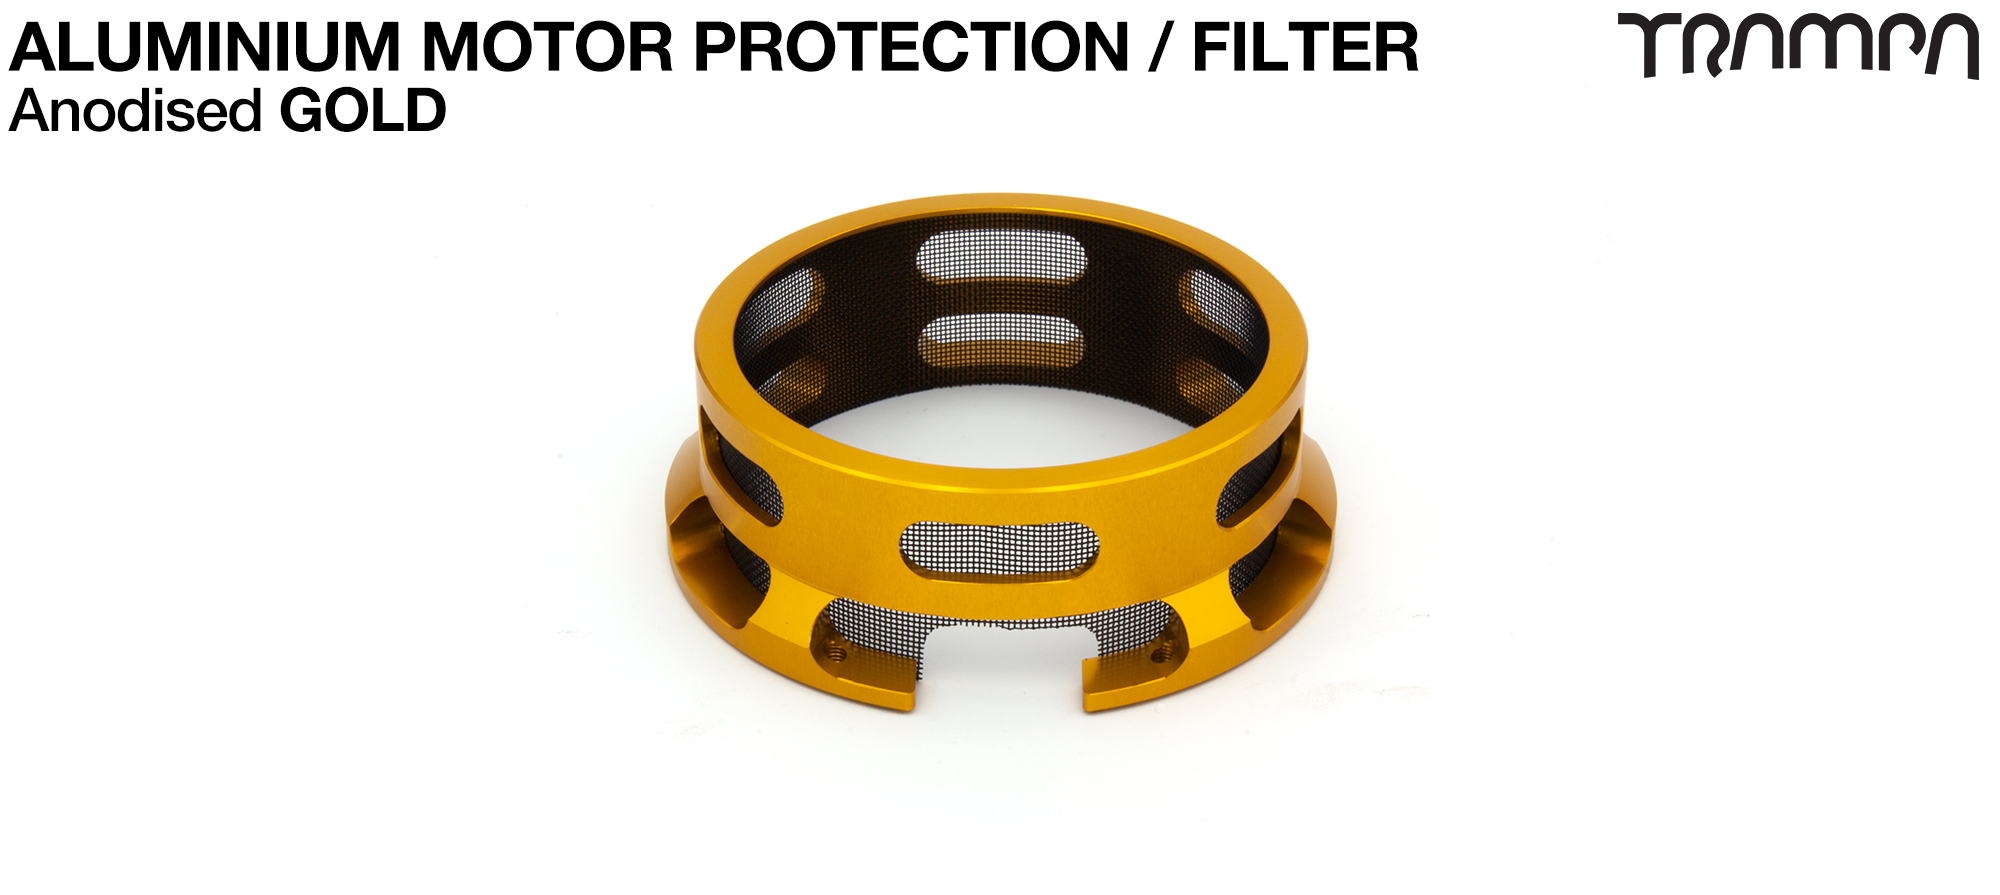 Aluminium Motor protection - GOLD